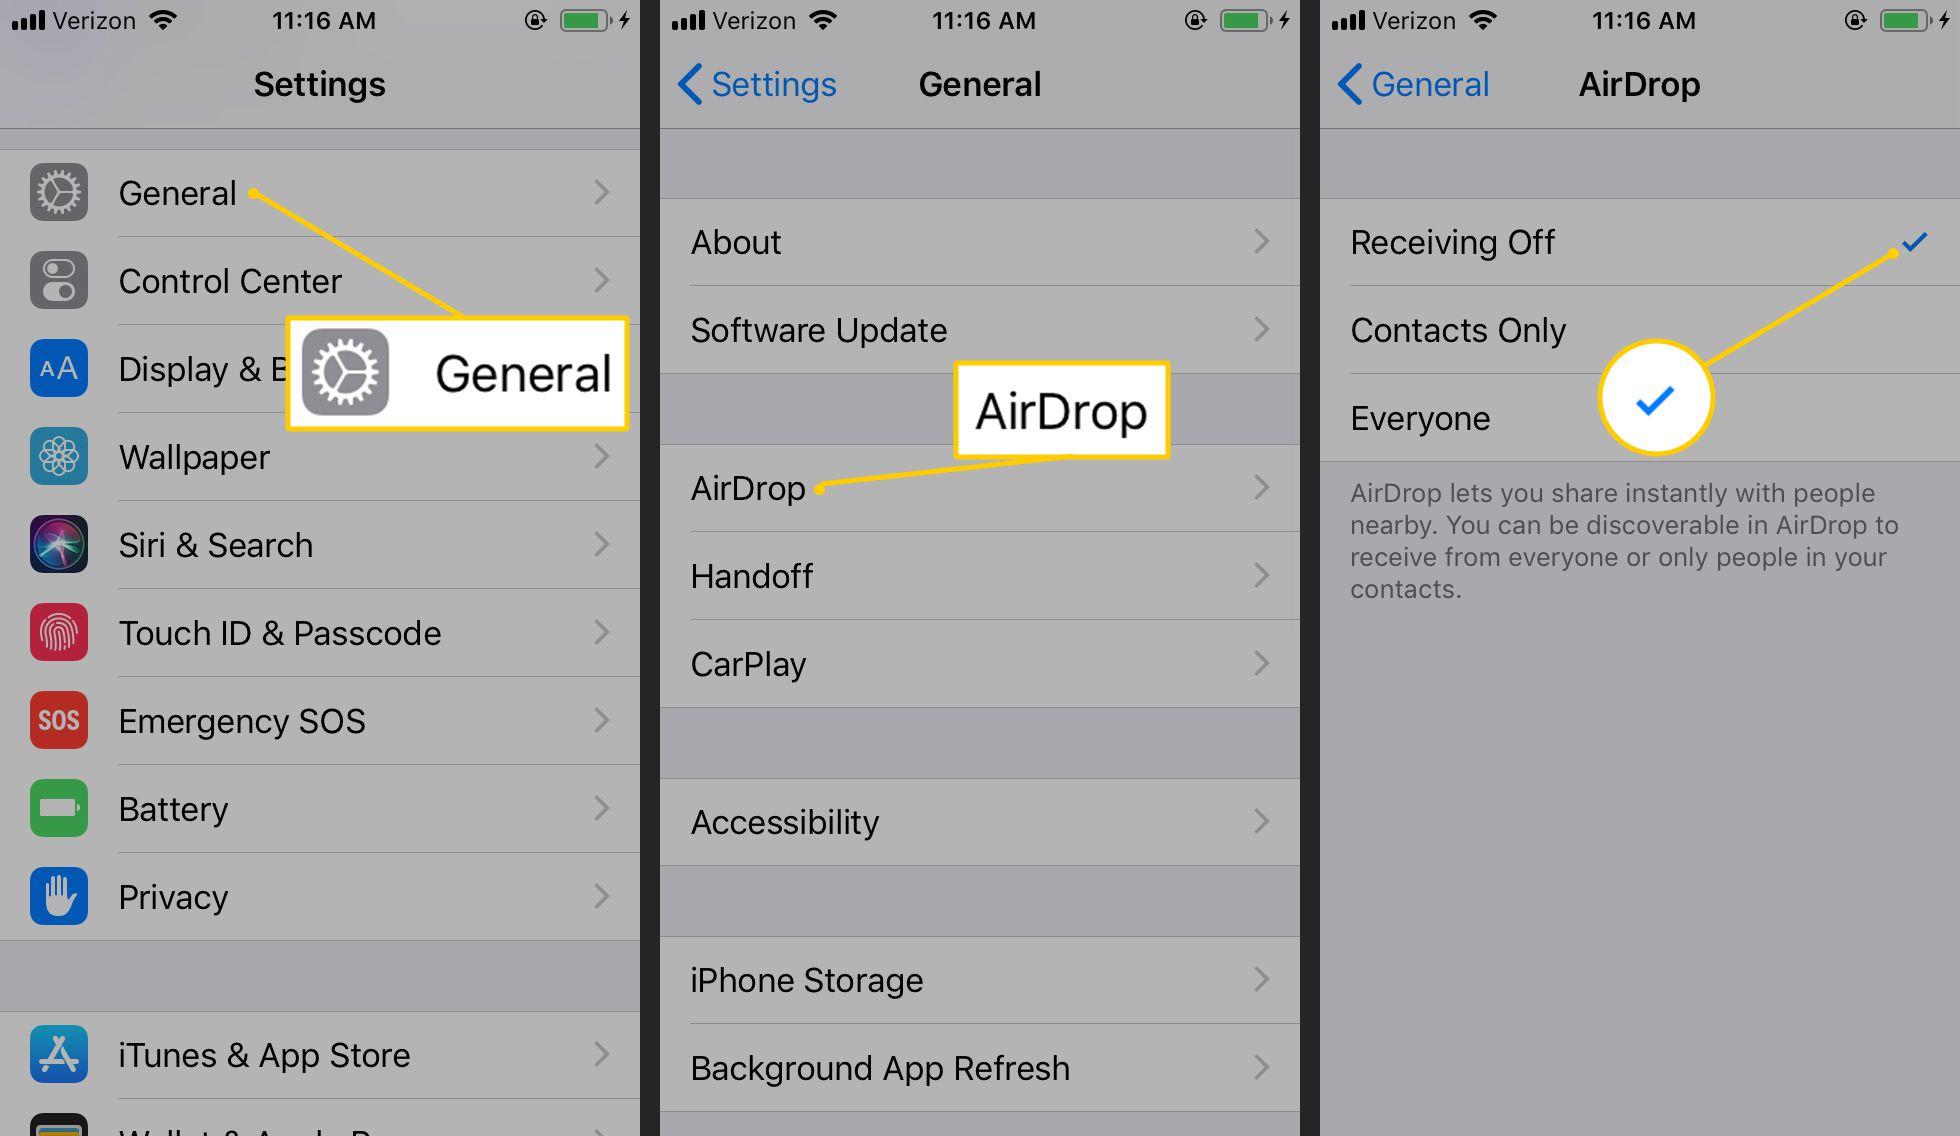 General, AirDrop, Receiving Off